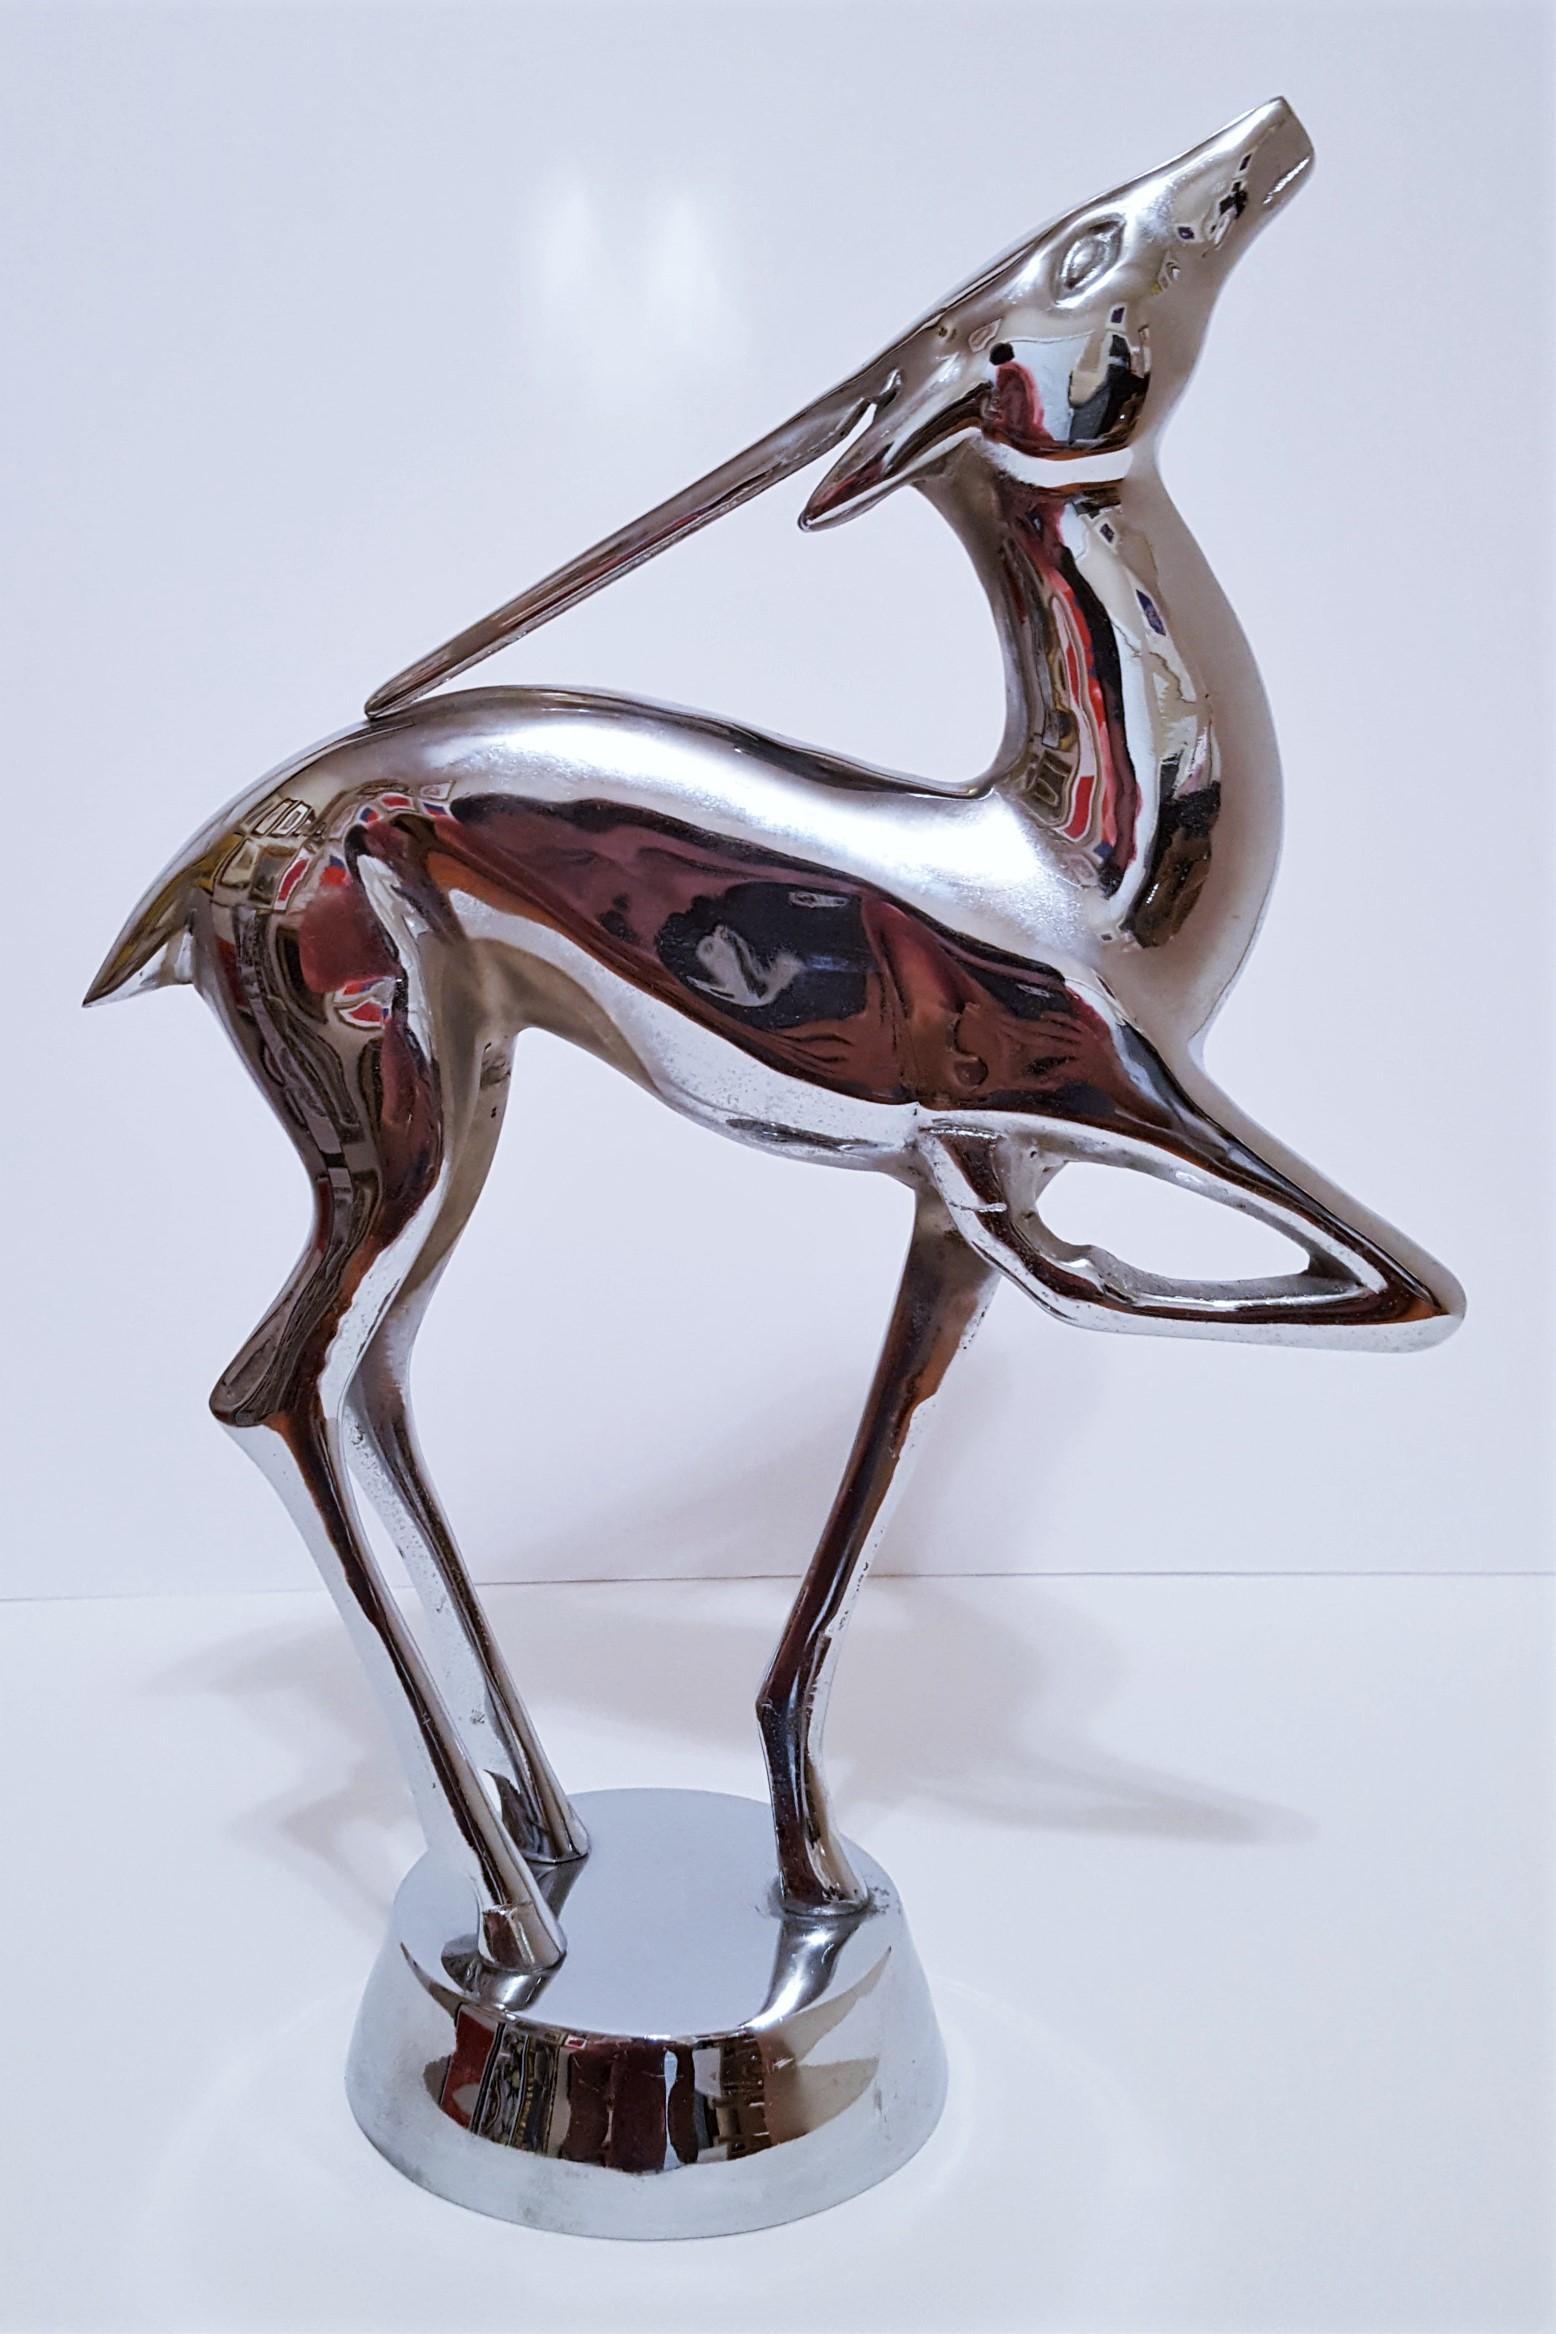 Art Deco Gazelle Antelope Modernist Chrome Metal Sculpture